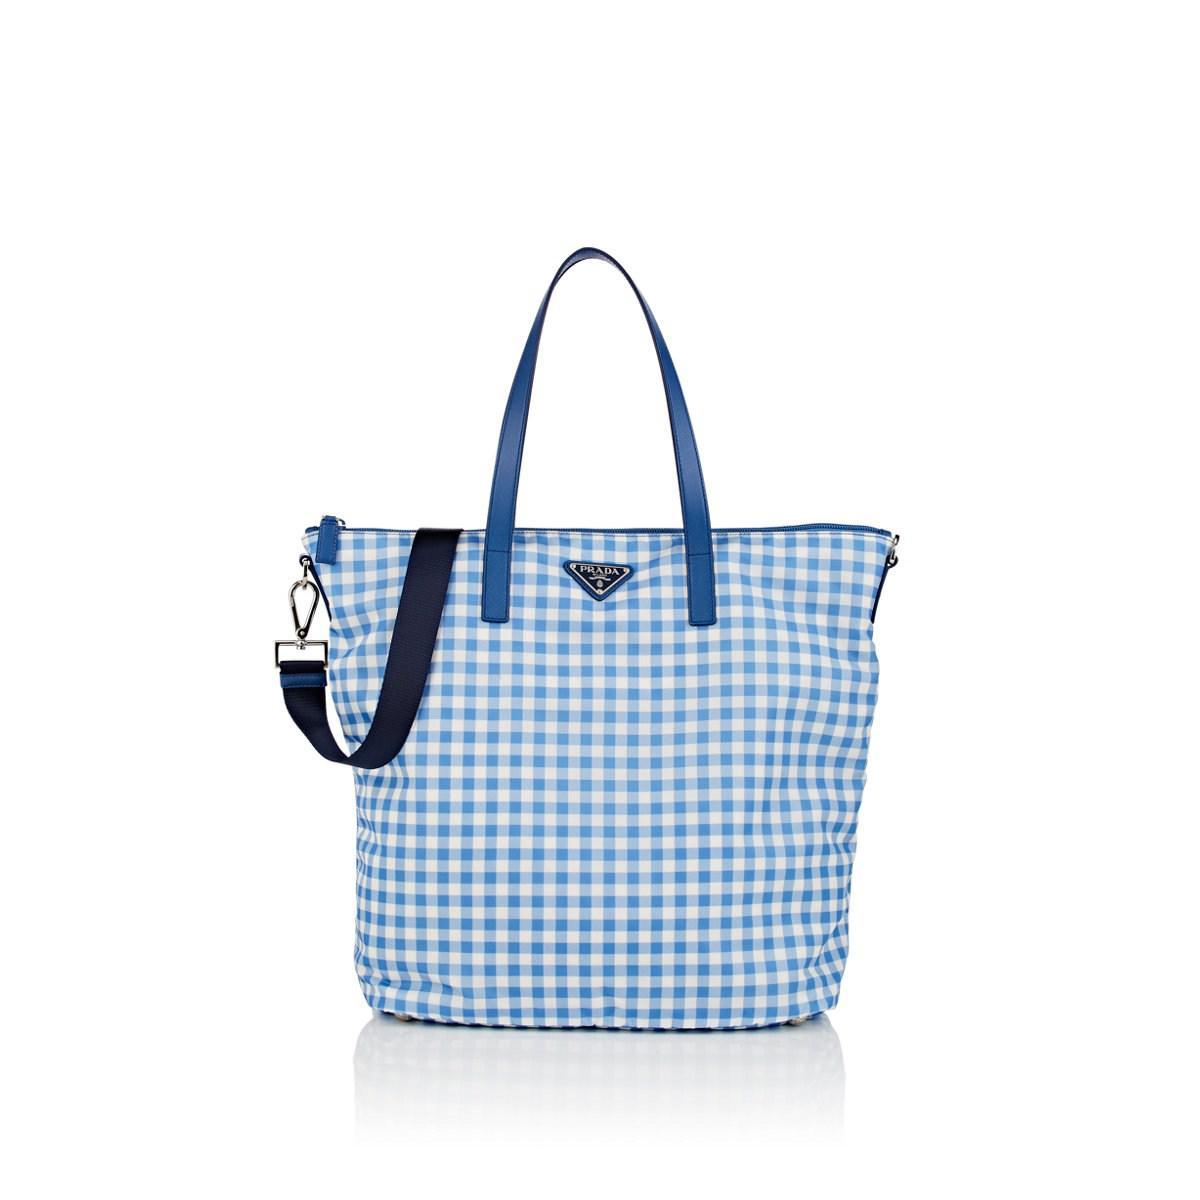 8de02b49d383 Prada Donna Lady Shopping Tote Bag in Blue - Lyst